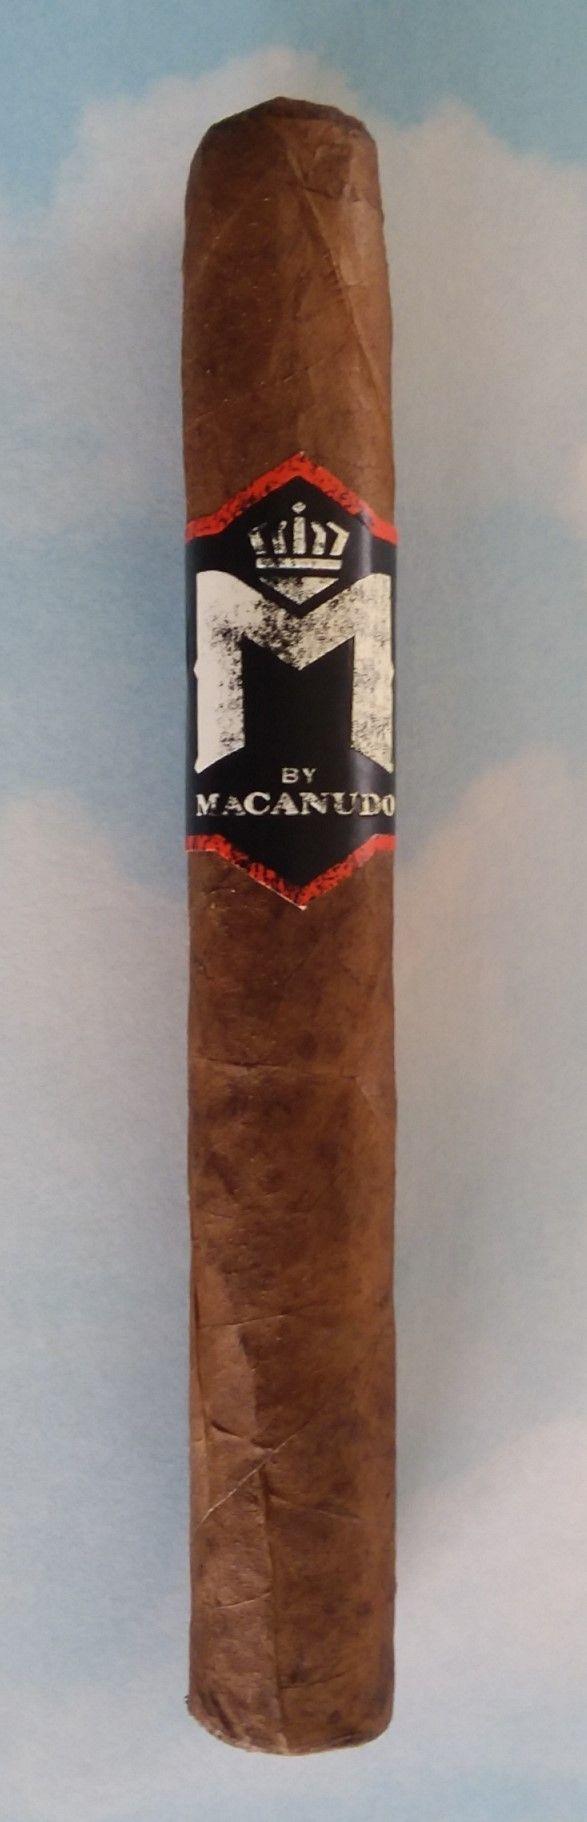 Macanudo M Cigar